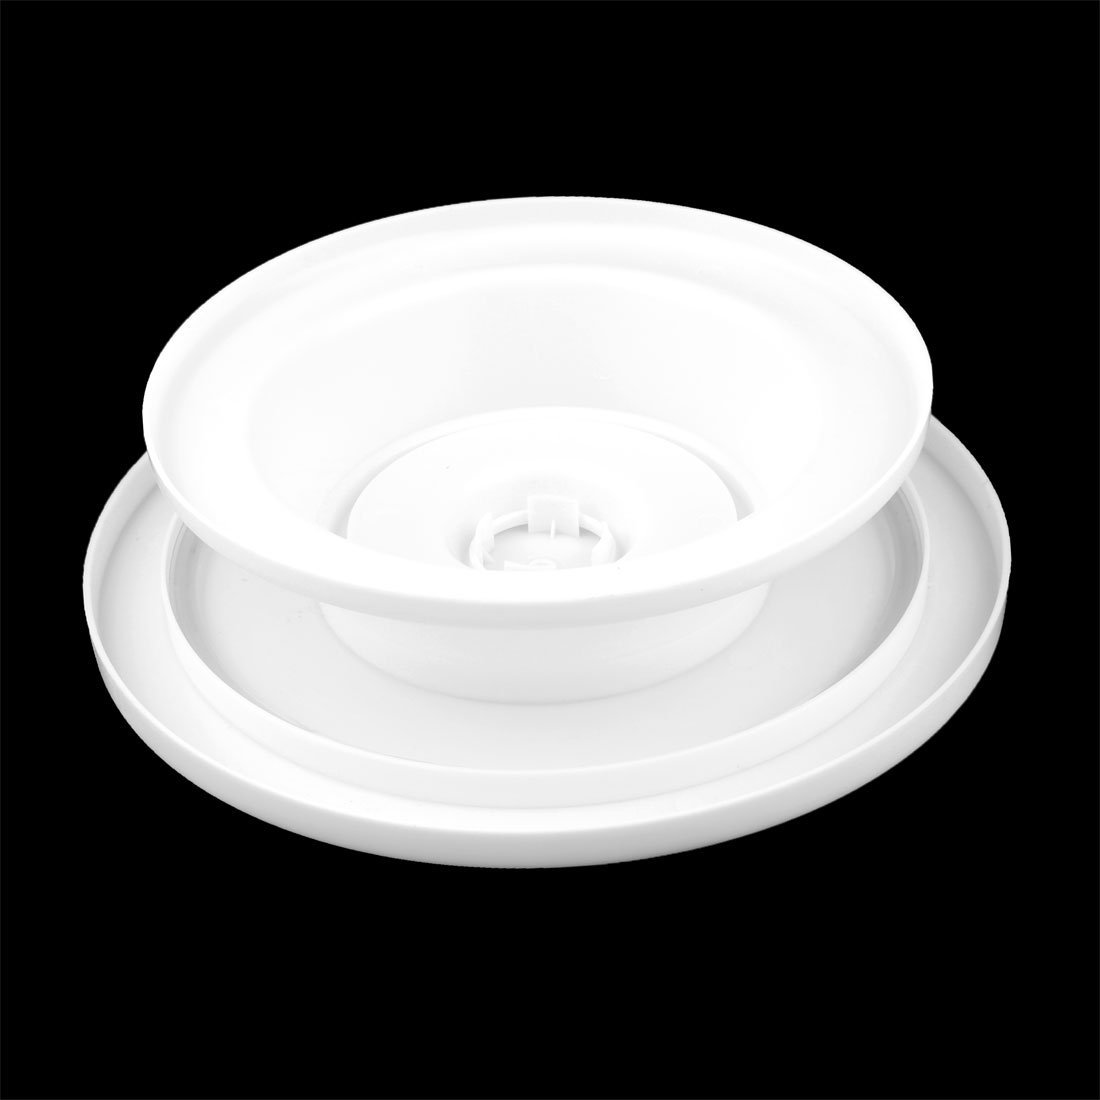 DealMux plástico Home Cocina Panadería forma redonda Pastelaria do Bolo do queque decoração Turntable Branco: Amazon.es: Hogar